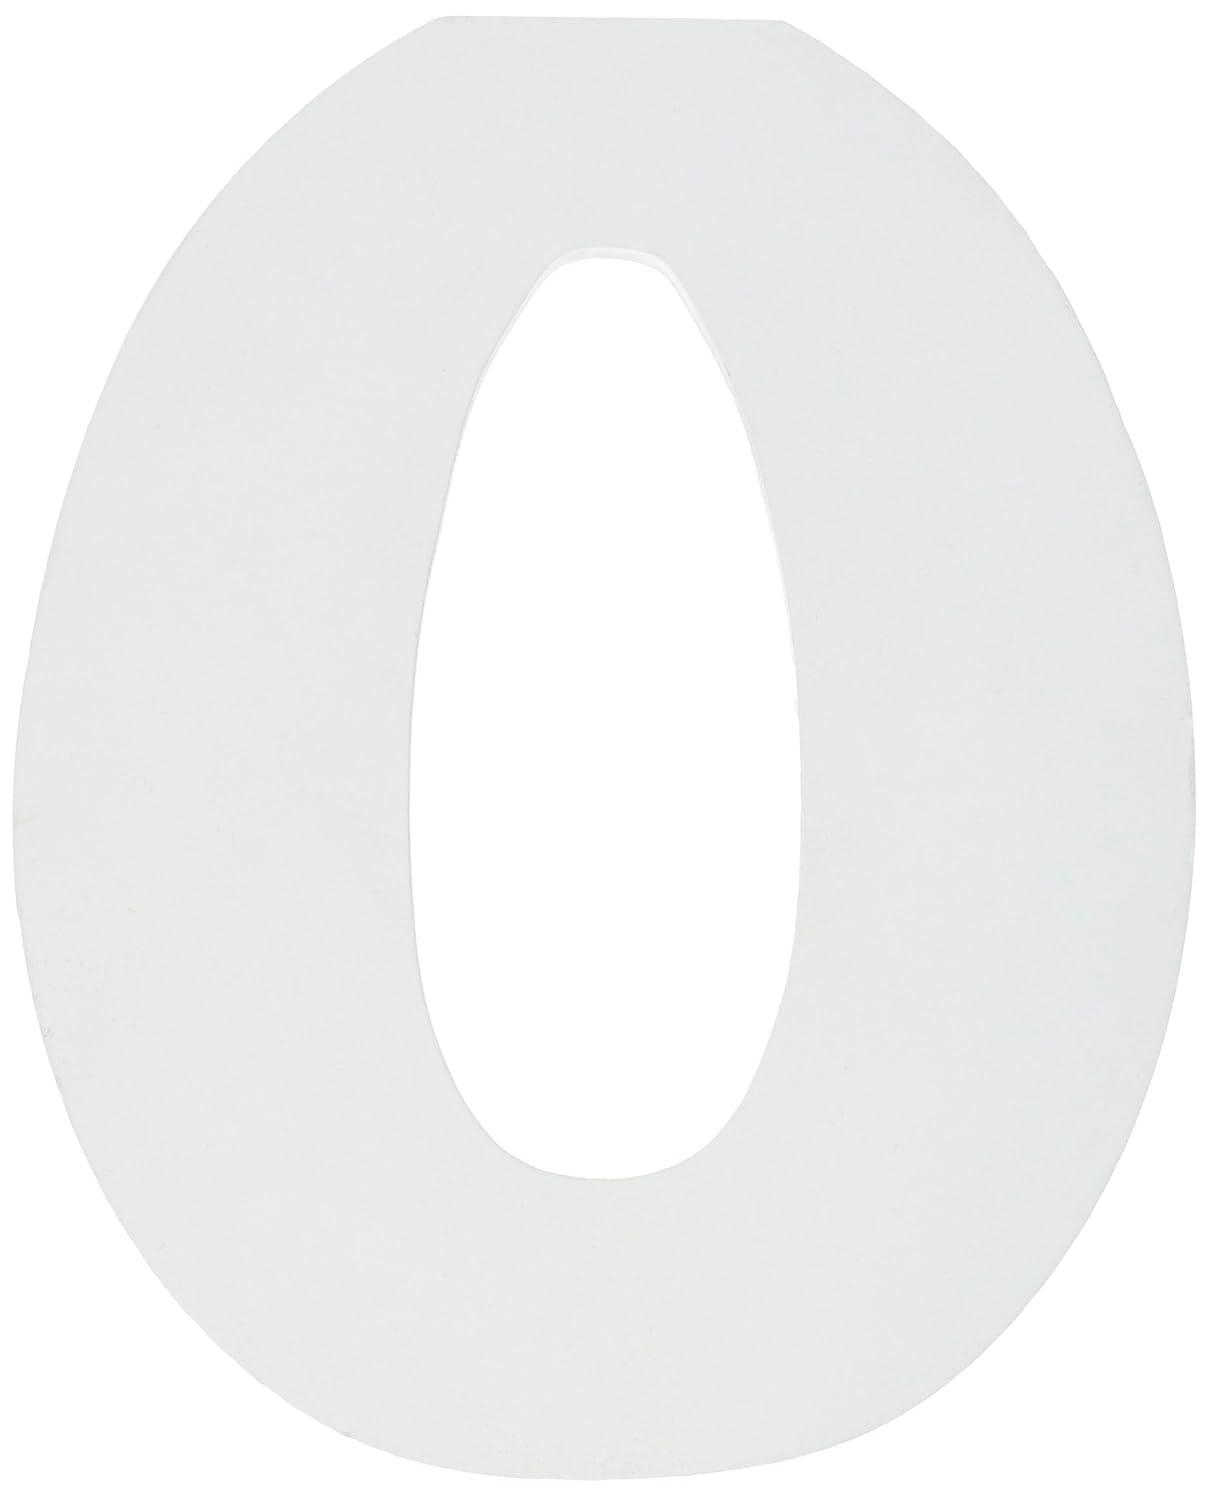 Darice U9182-0 Unfinished Wood Number 0, 6